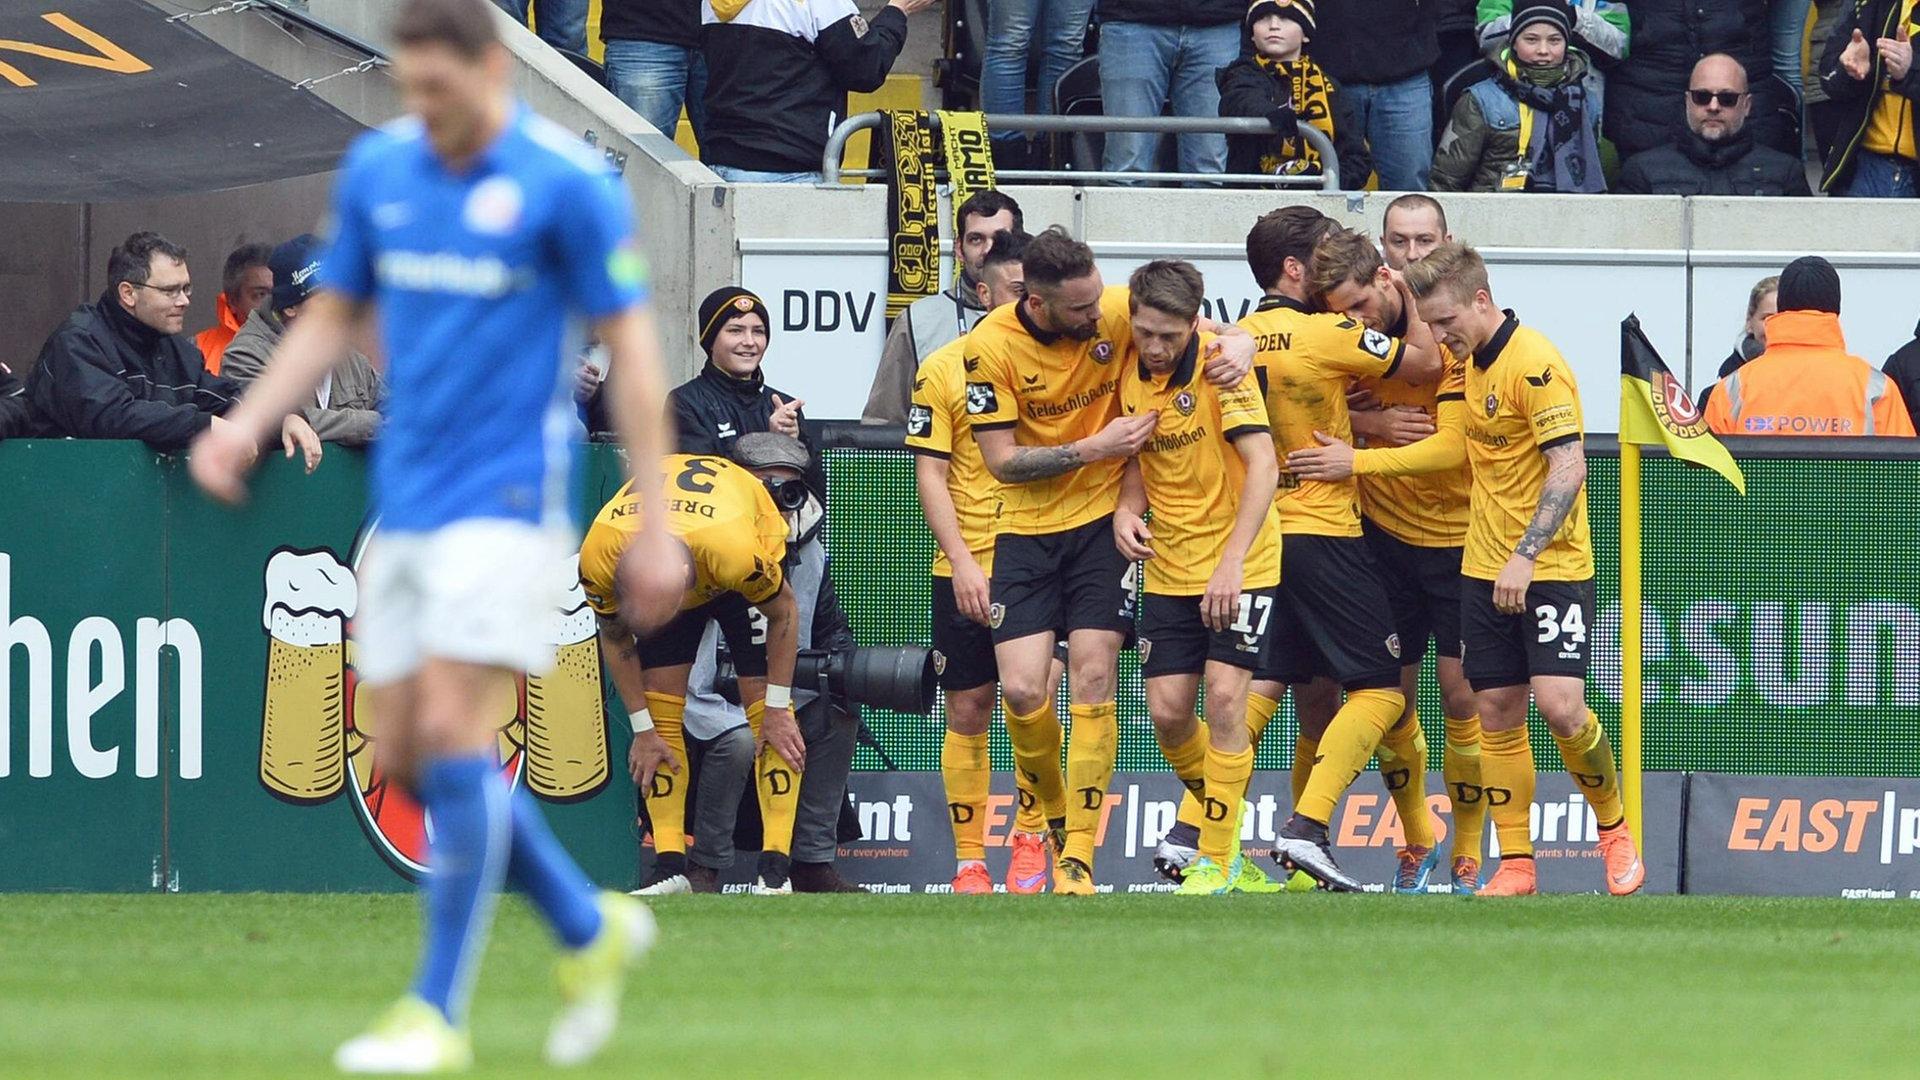 Hansa Rostock Dynamo Dresden Keine Fans Trotzdem Derby Atmosphare Ndr De Sport Fussball